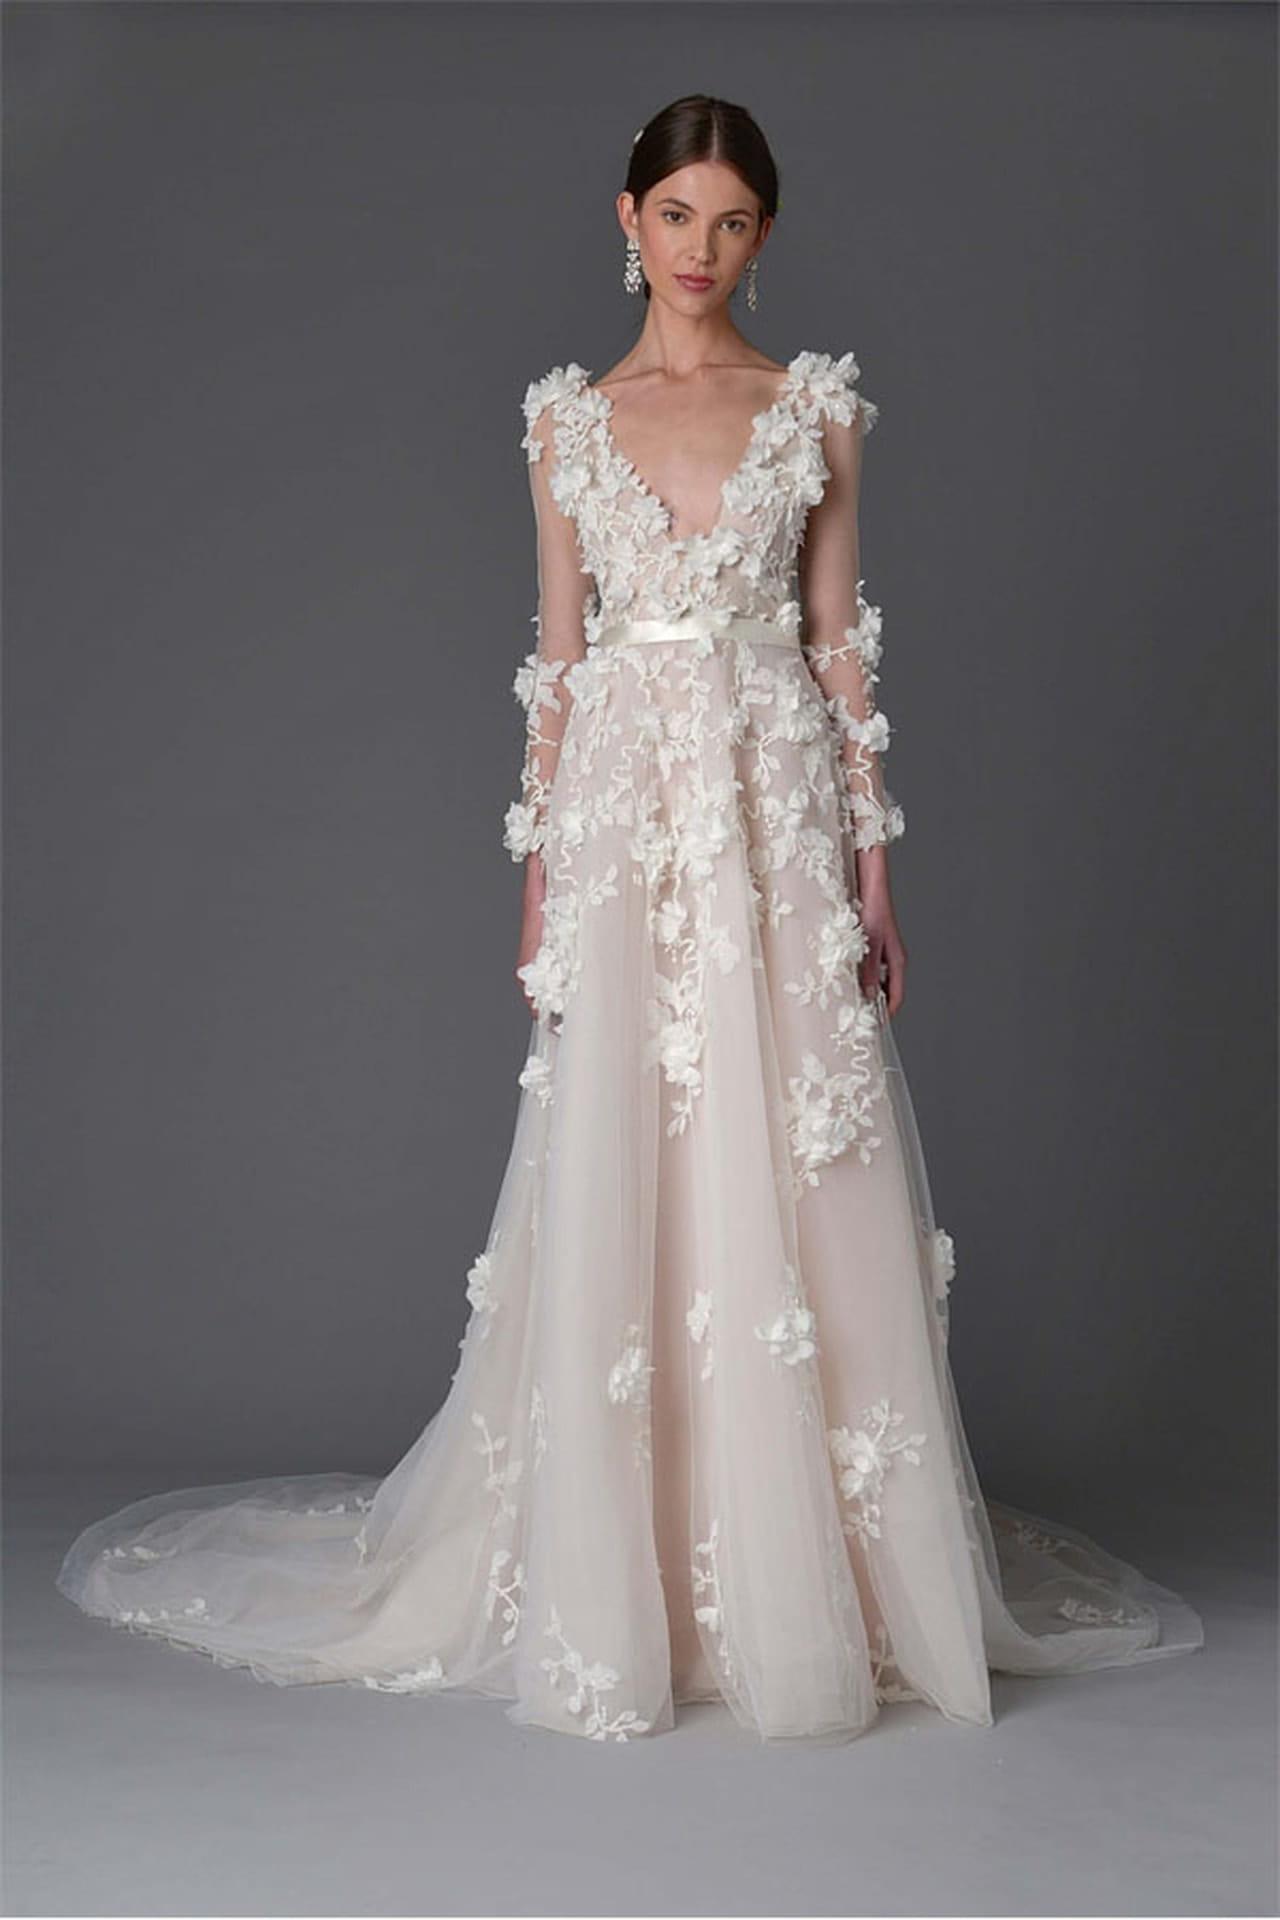 1274c7f176542 فستان زفاف ماركيزا. لعاشقات الورود .